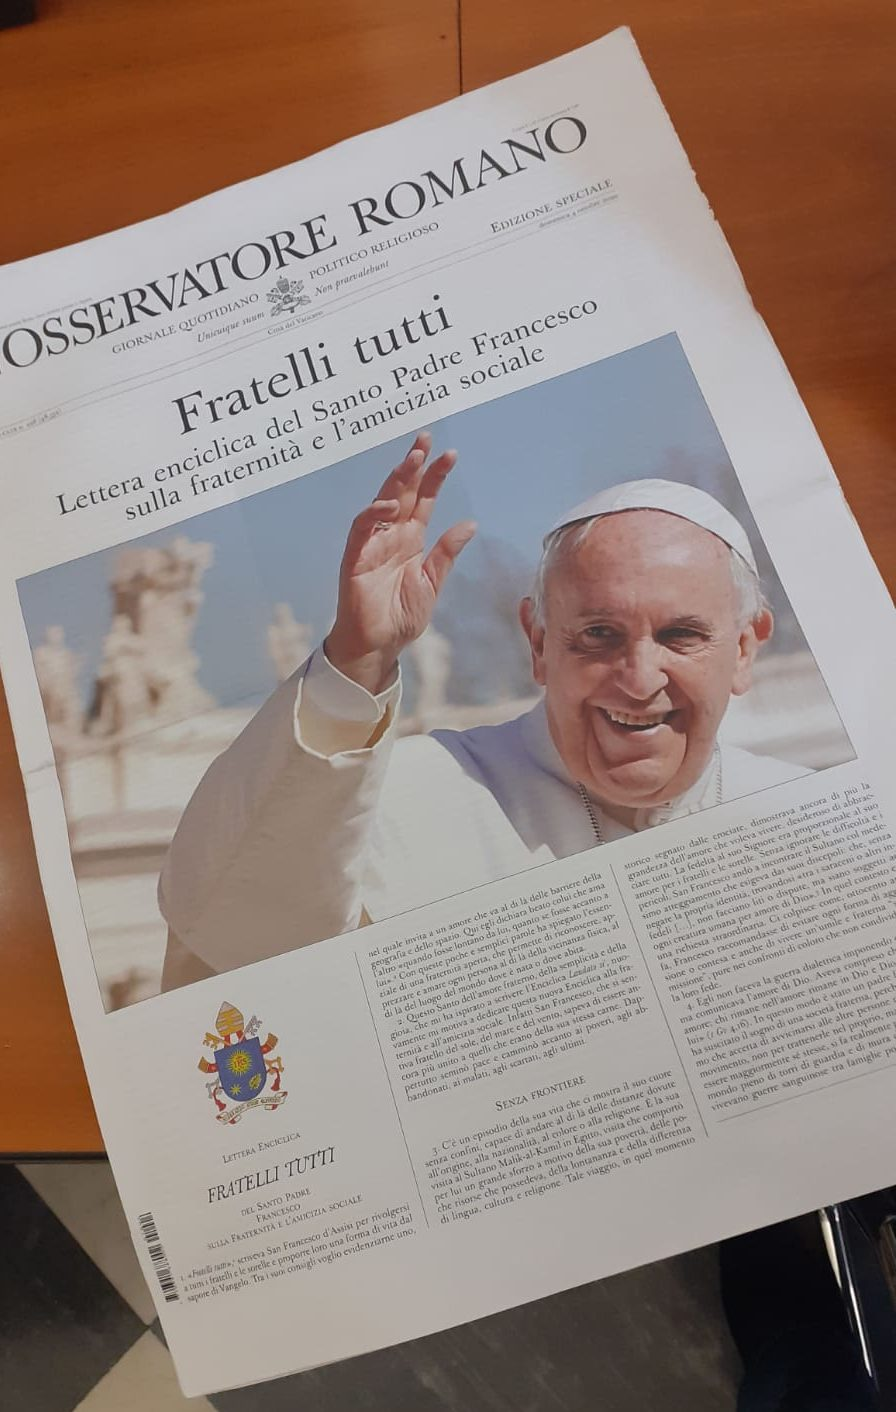 Fratelli tutti sur L'Osservatore Romano, 4 octobre 2020 © Zenit, AKM